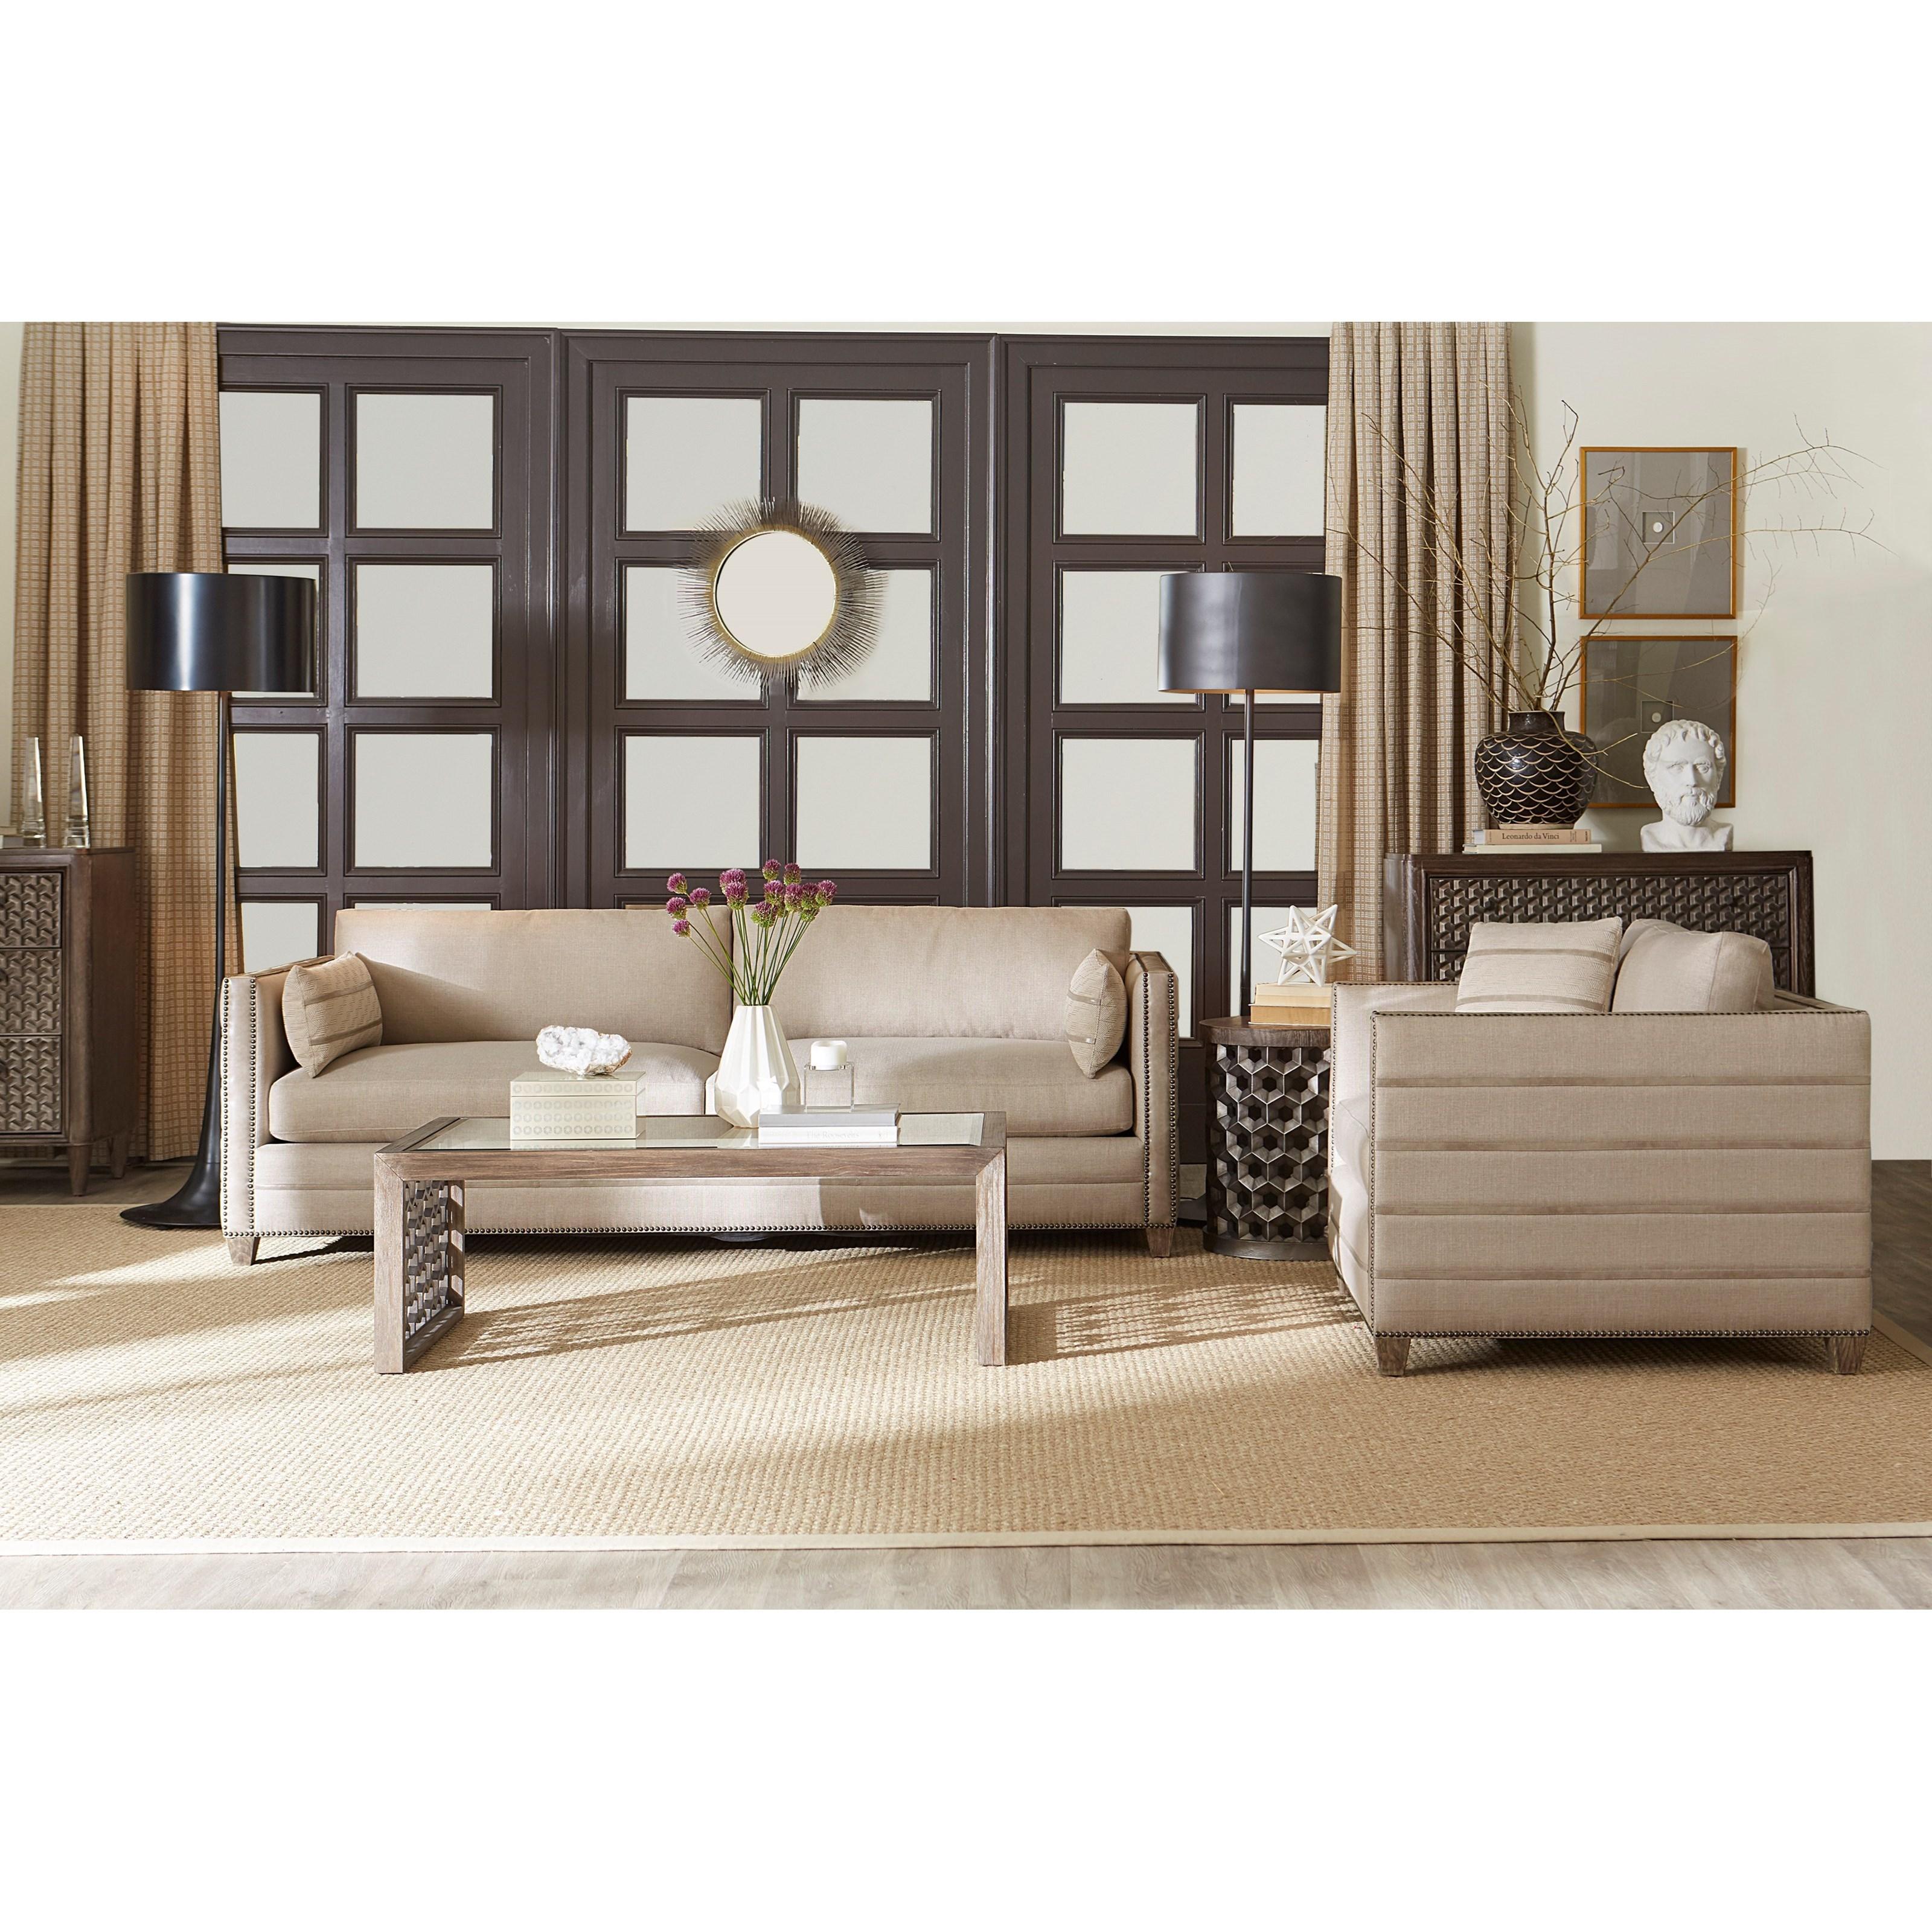 A.R.T. Furniture Inc Allister GreigeStationary Living Room Group